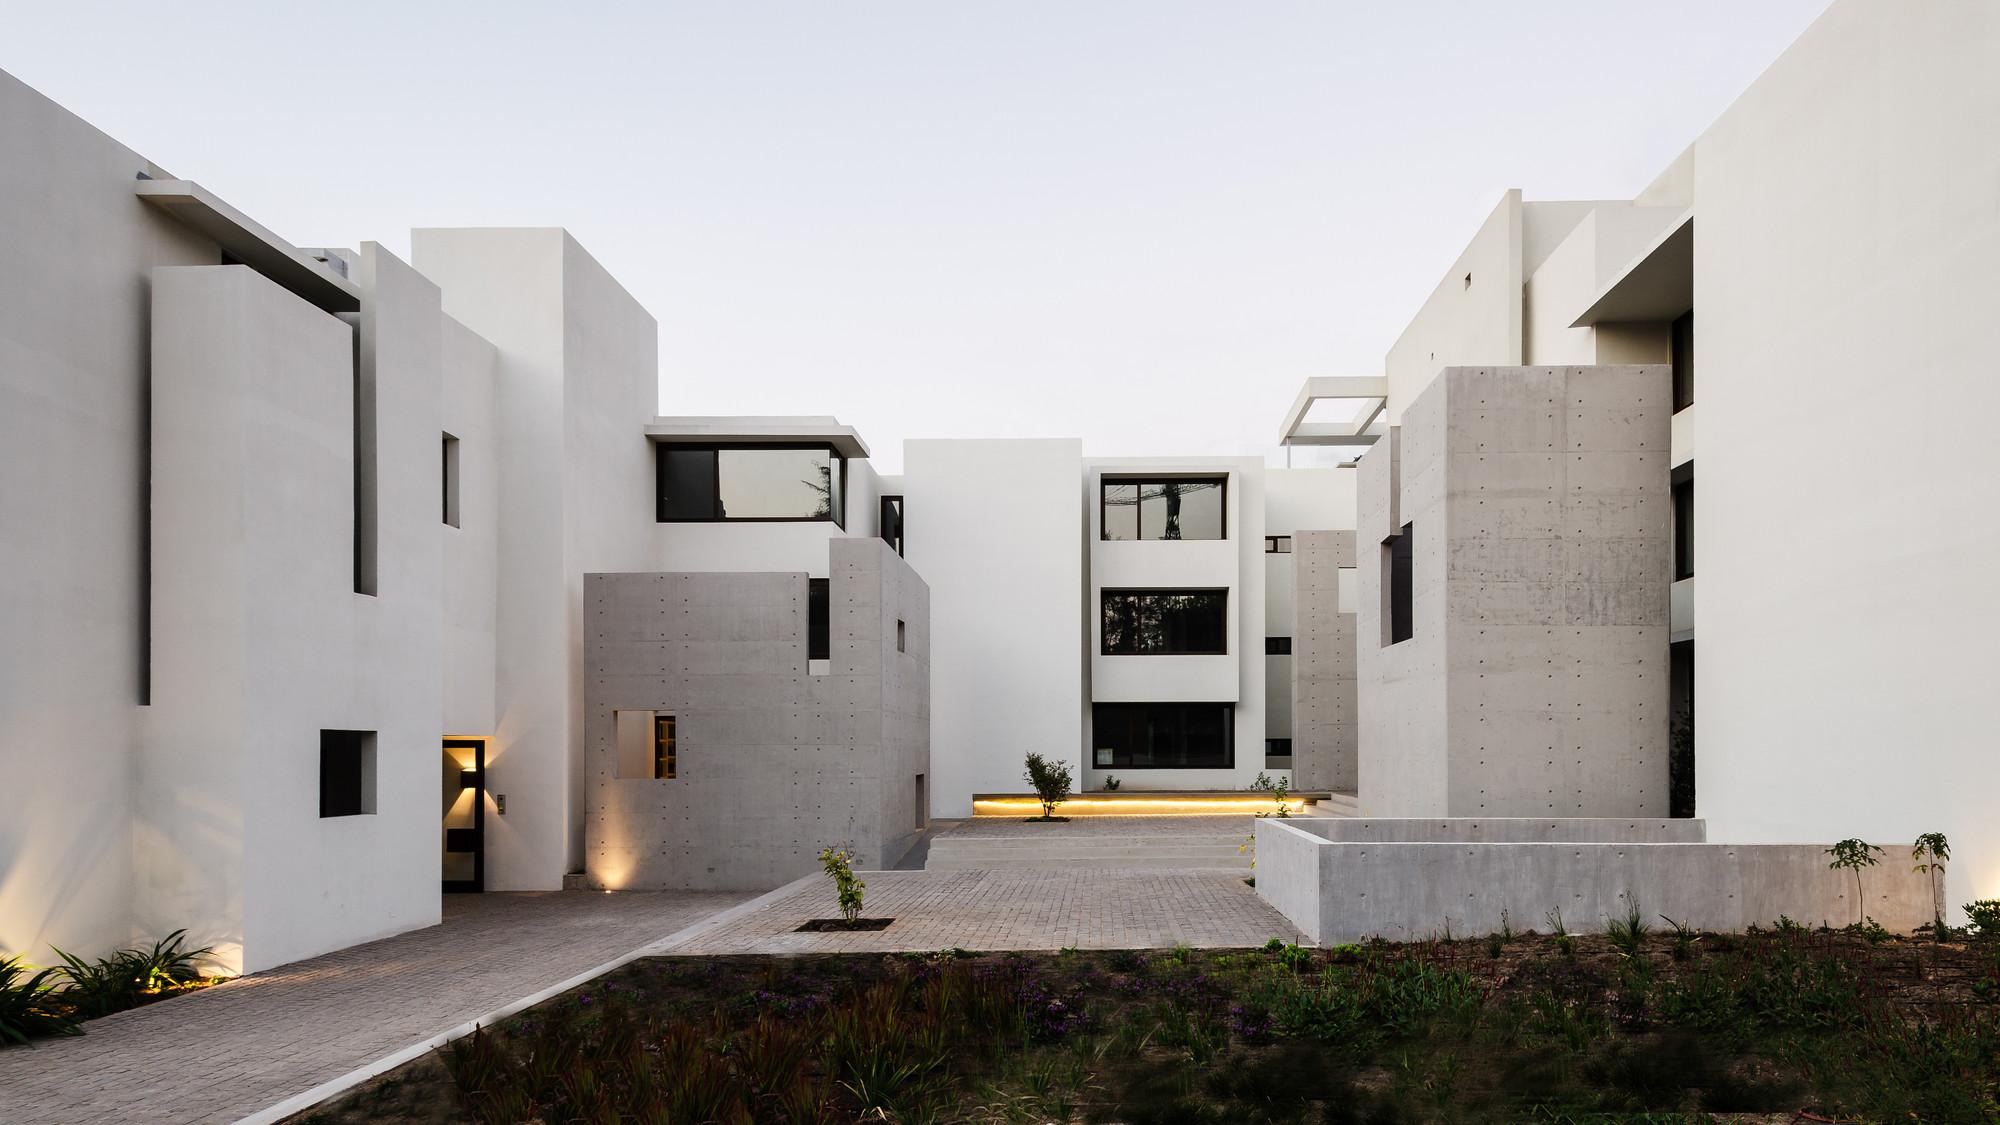 Fray León Building / Jorge Figueroa + Asociados, © Pablo Blanco